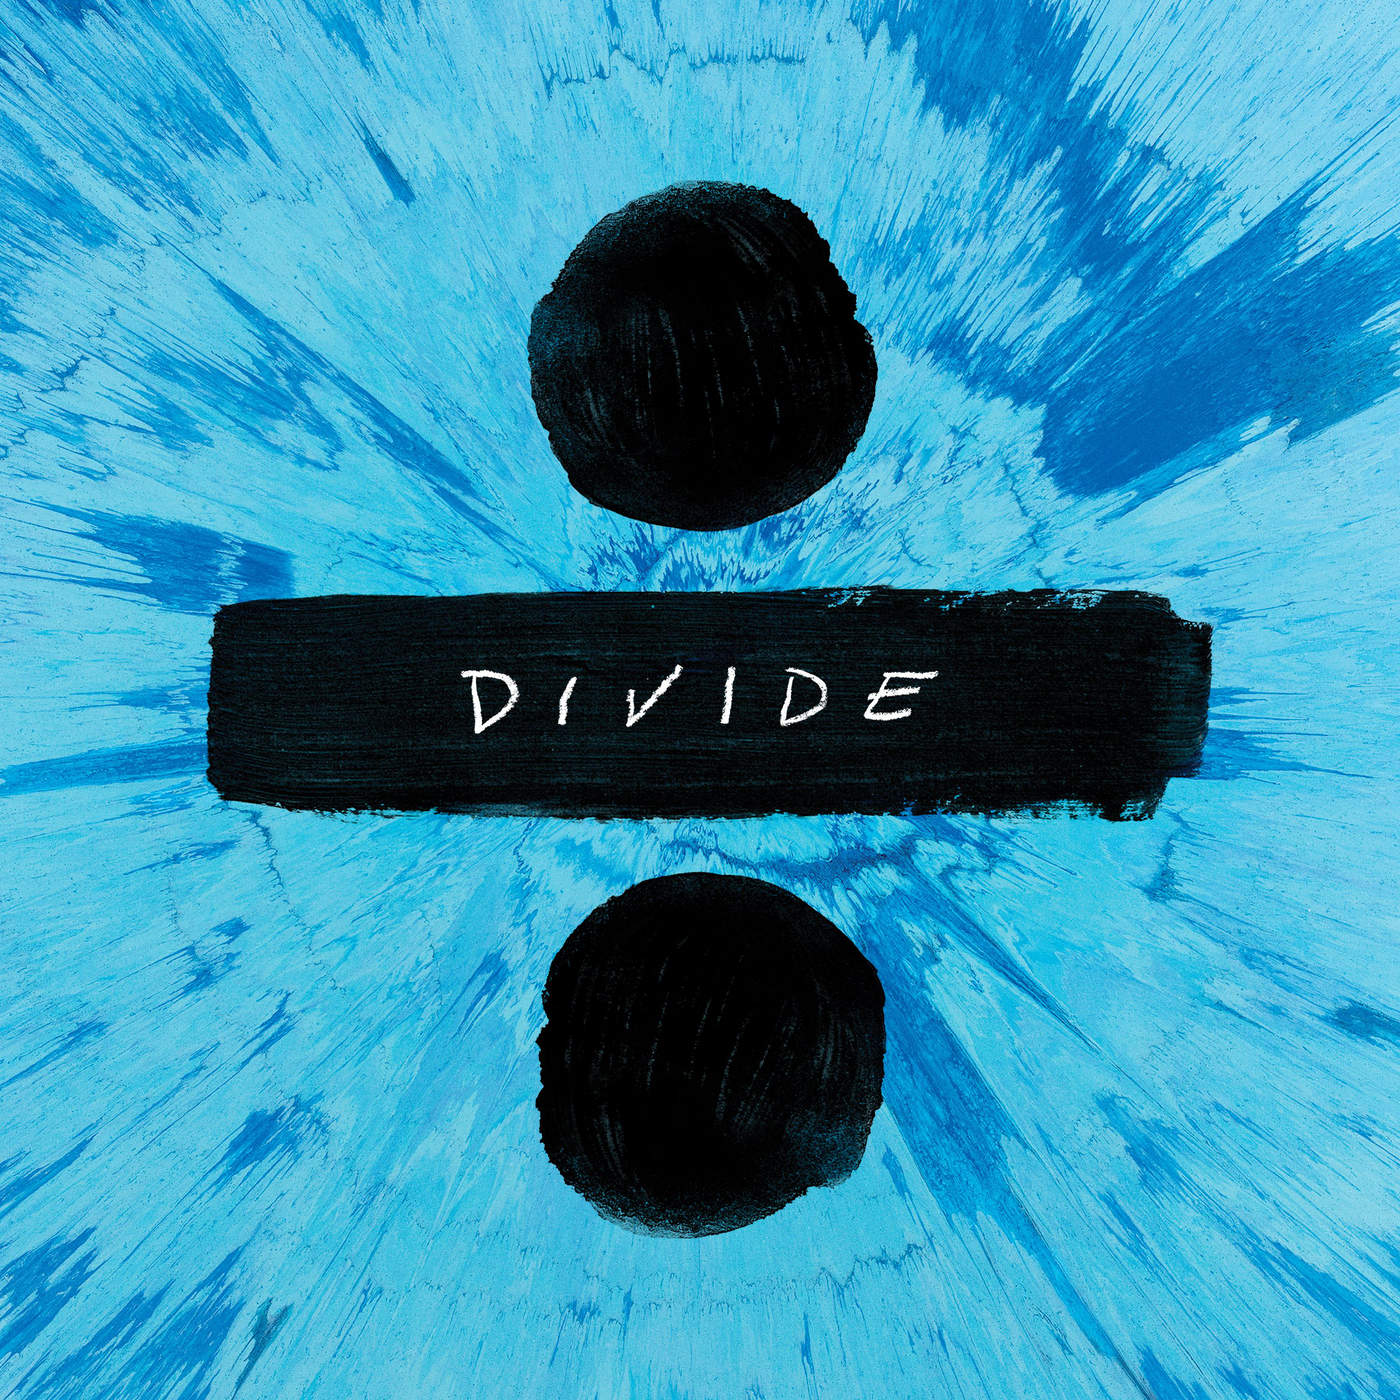 Ed Sheeran - Perfect (Acoustic) - Single